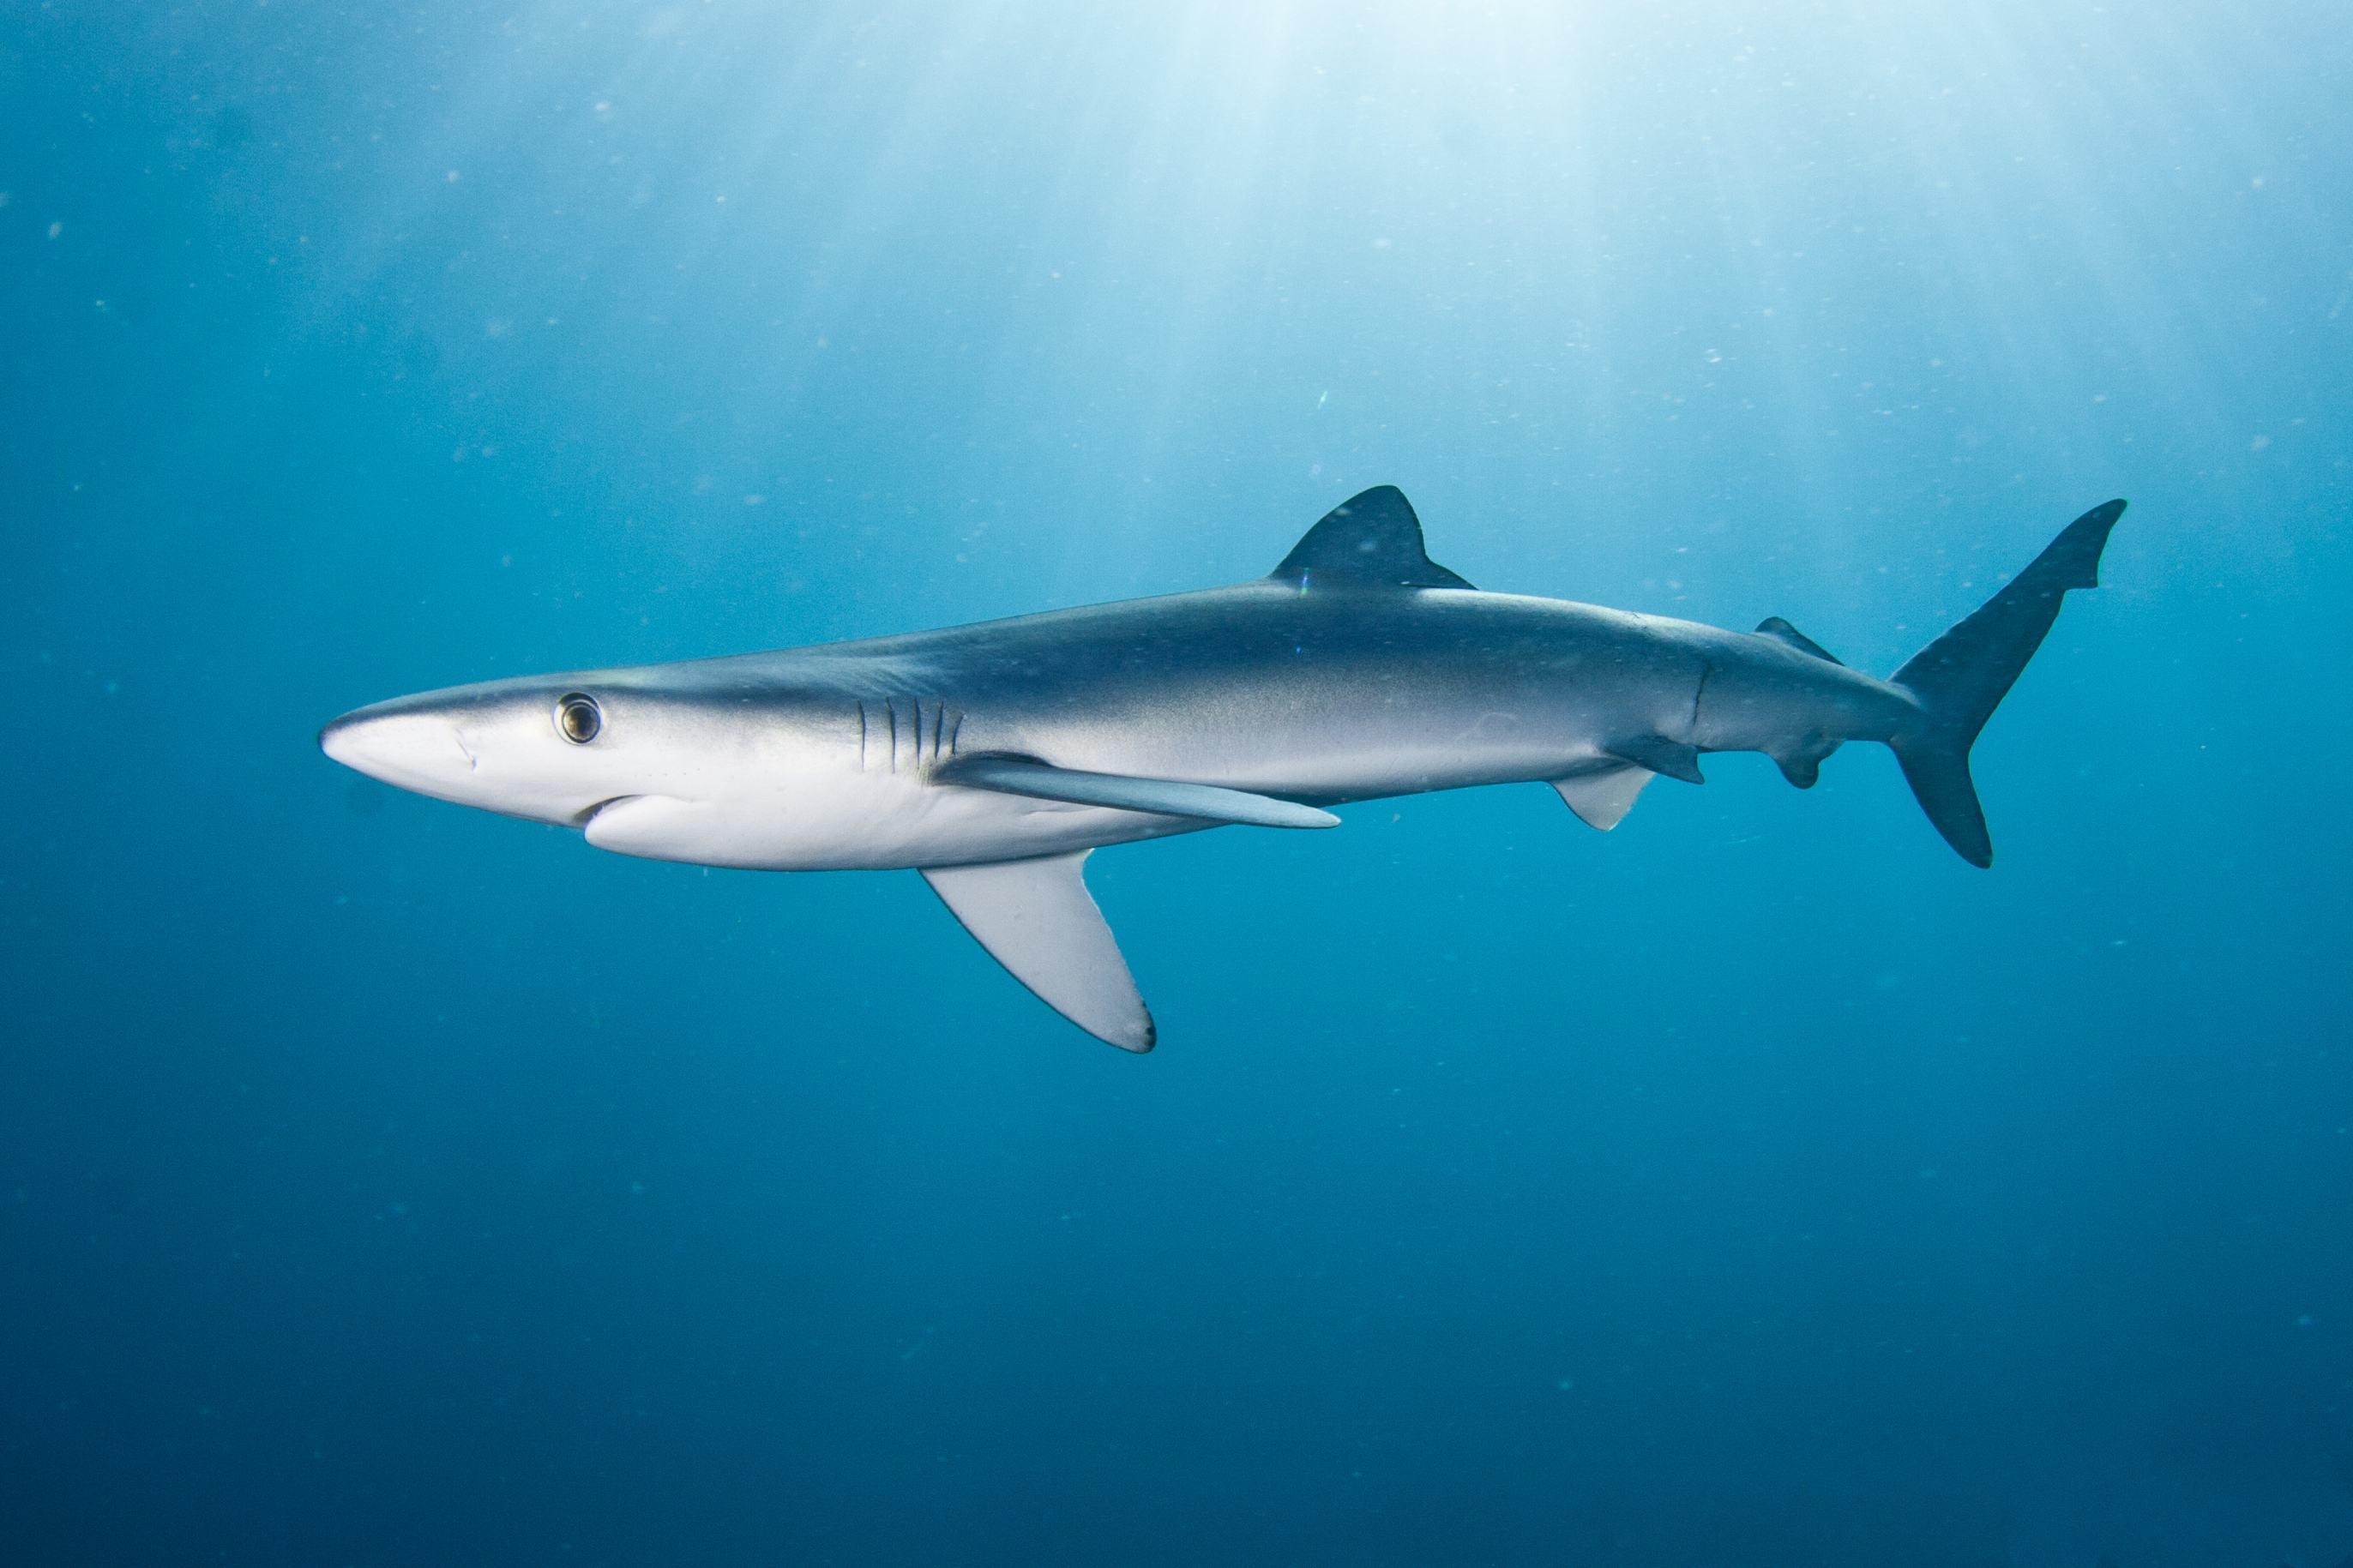 download shark wallpapers wallpaper - photo #41